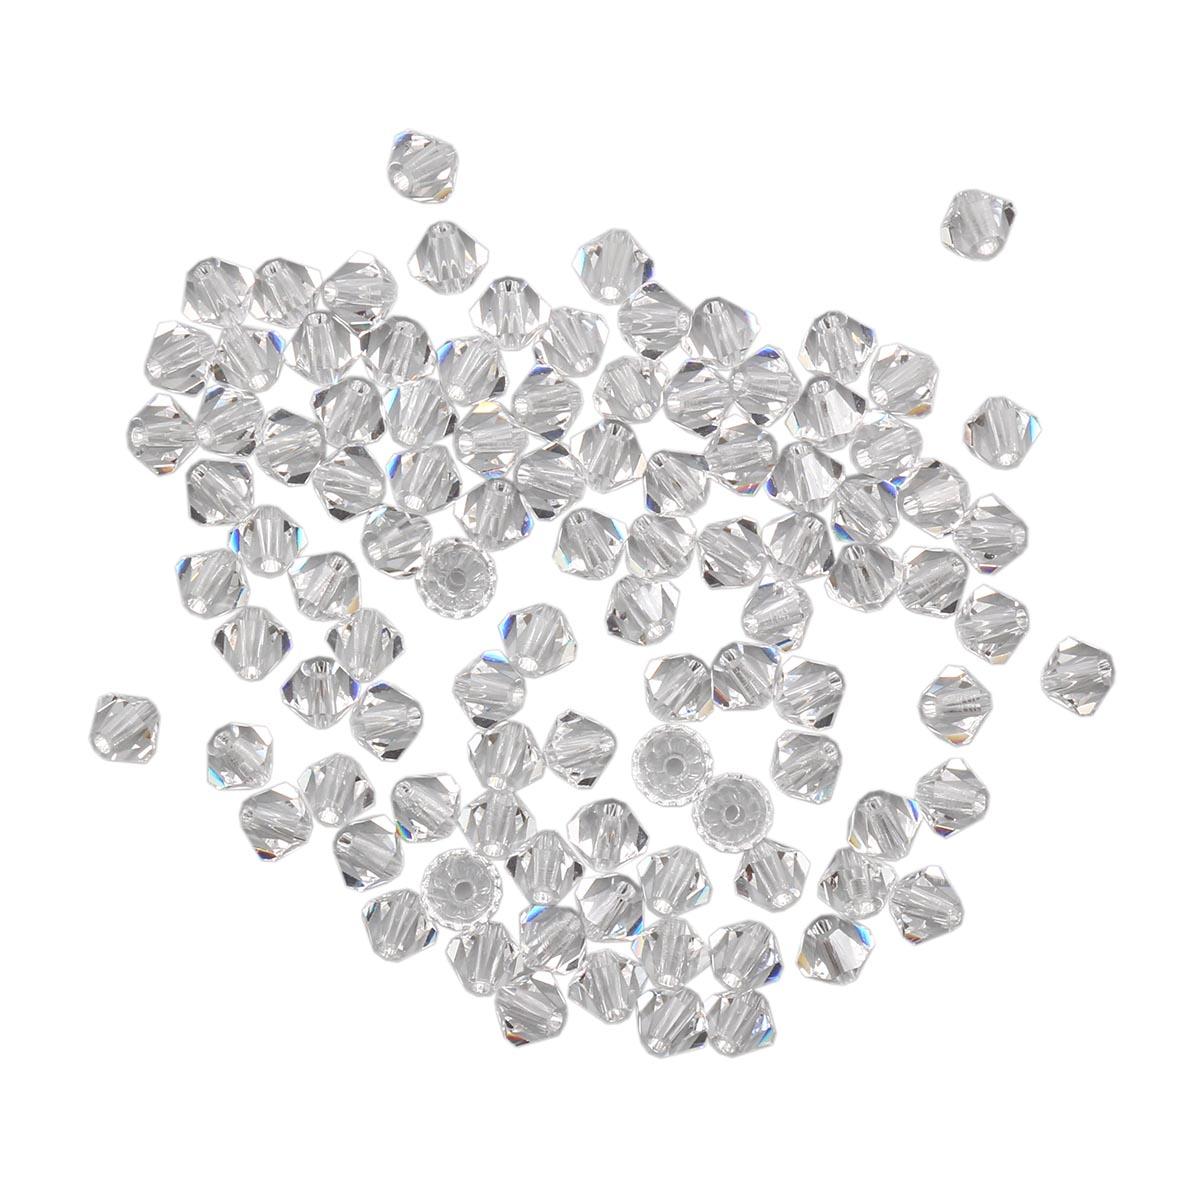 451-69-302 Бусины Биконус Crystal 3,6x4мм. 100 шт. Preciosa